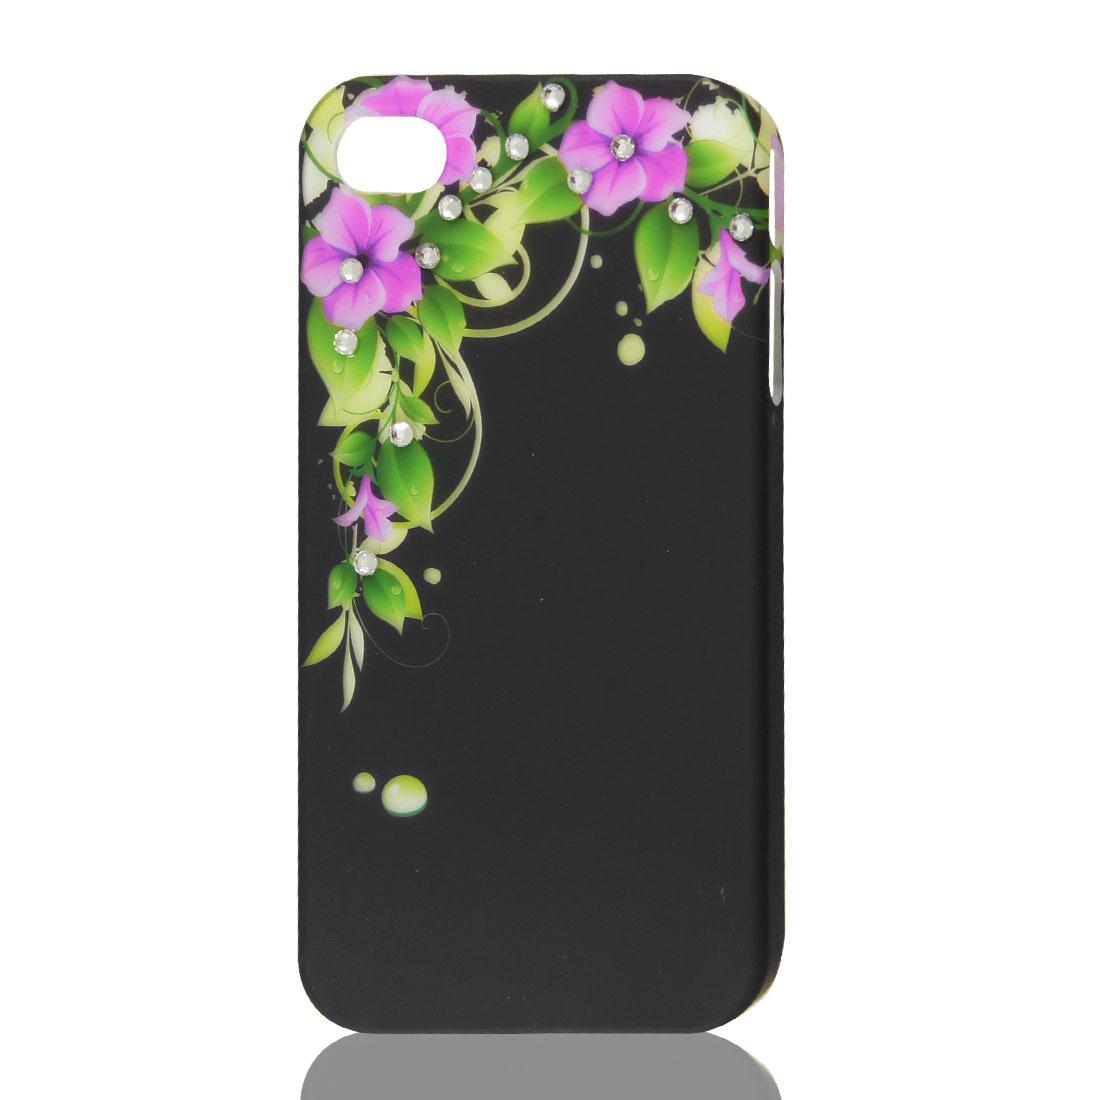 Black Glitter Rhinestone Flower Hard Back Case Cover Protector for iPhone 4G